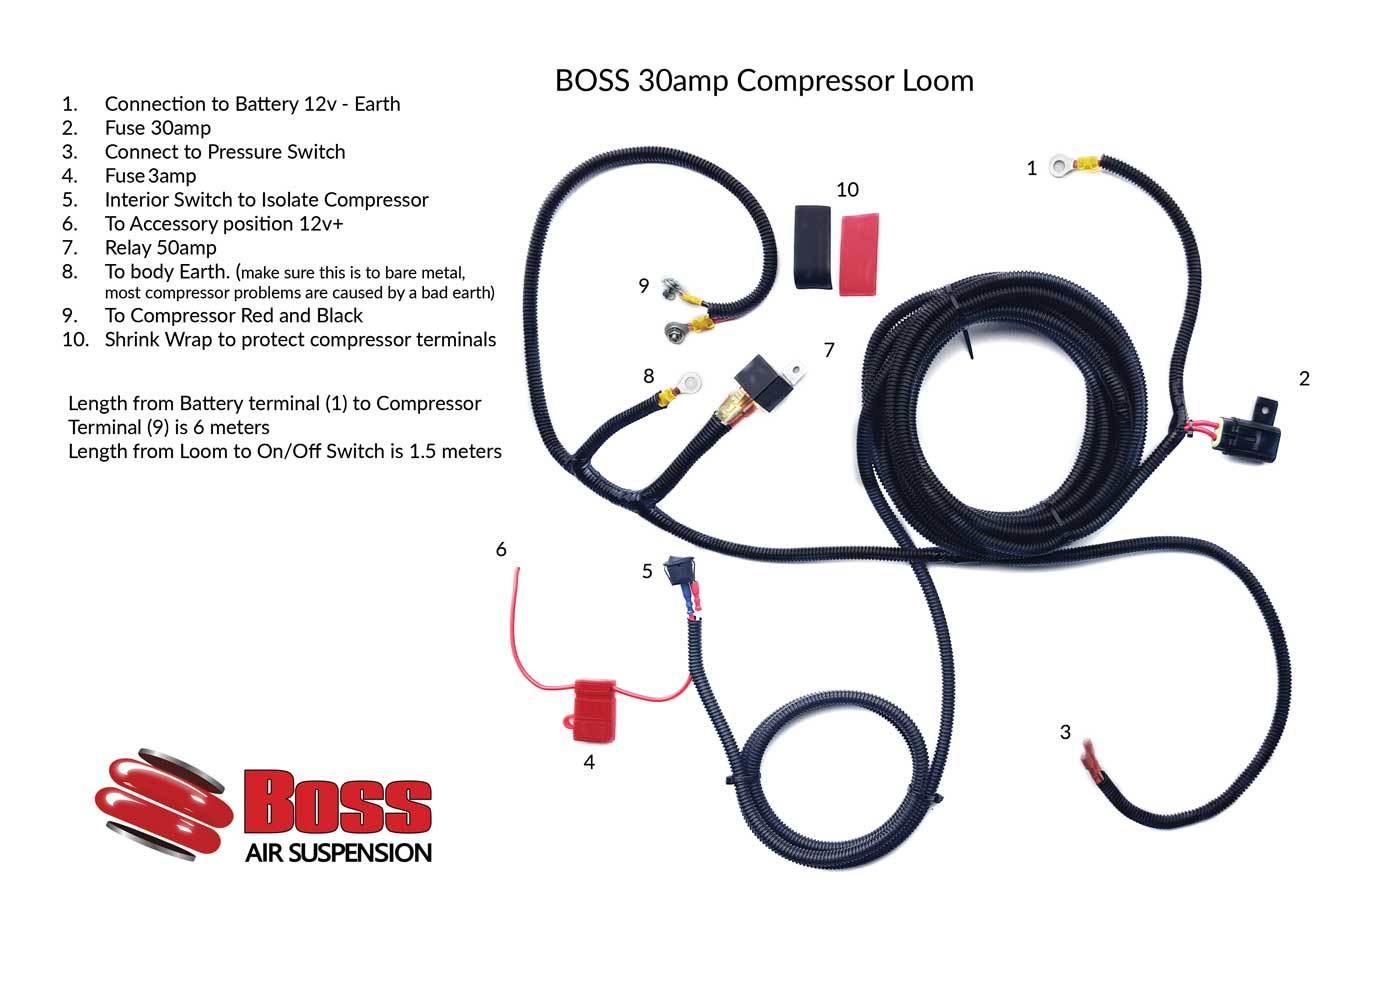 30amp-Compressor-Wiring-Loom Accuair Wiring Diagram on